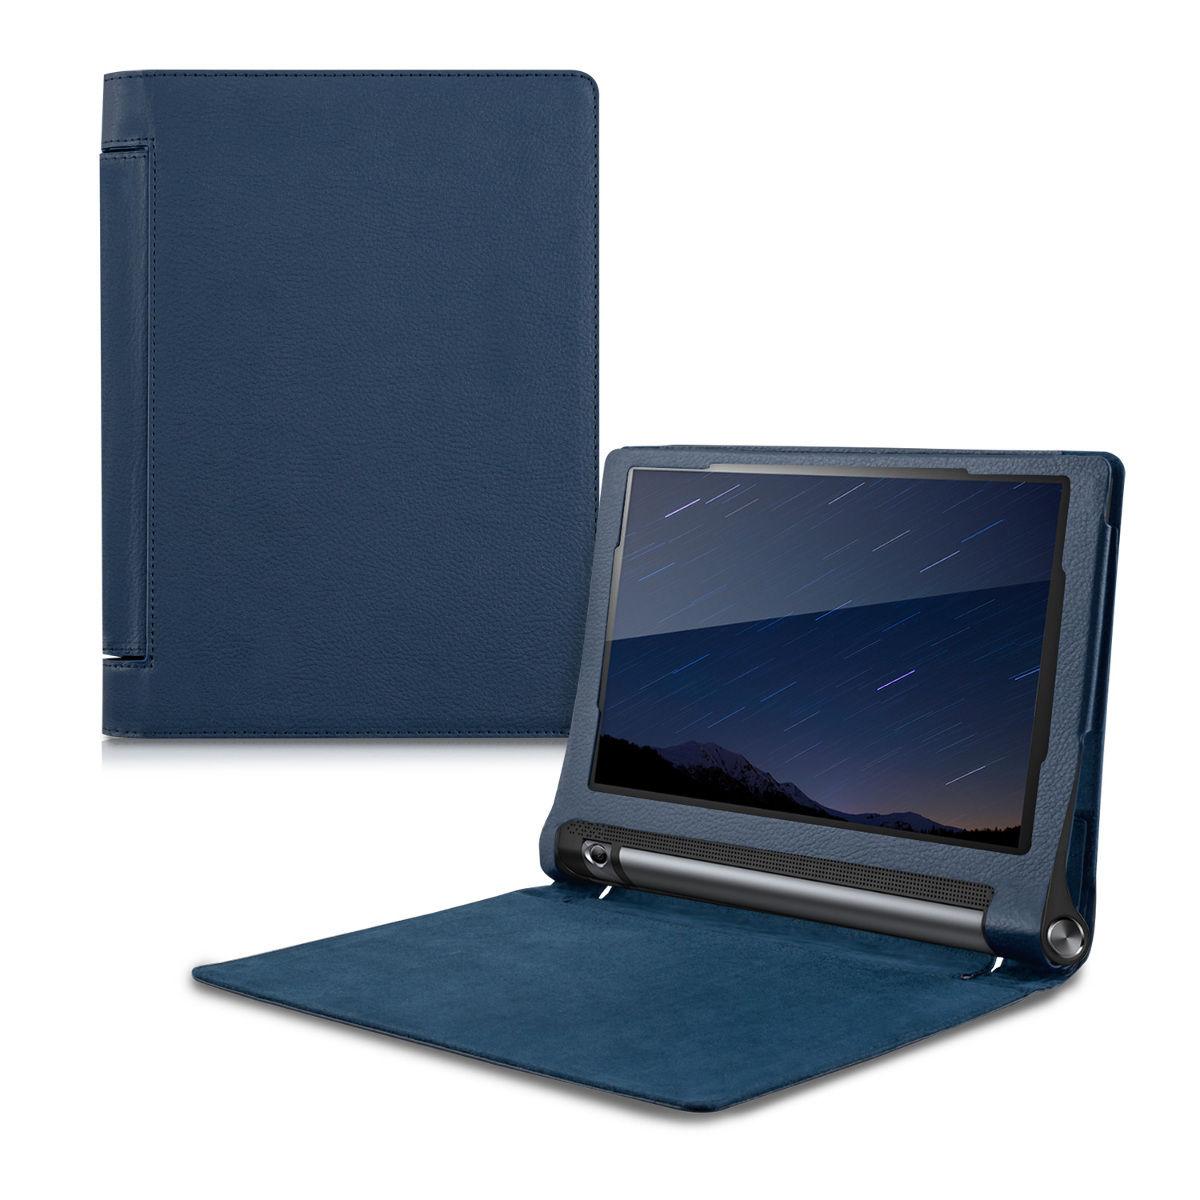 Pouzdro pro Lenovo YOGA Tablet 3 10 tmavě - modré